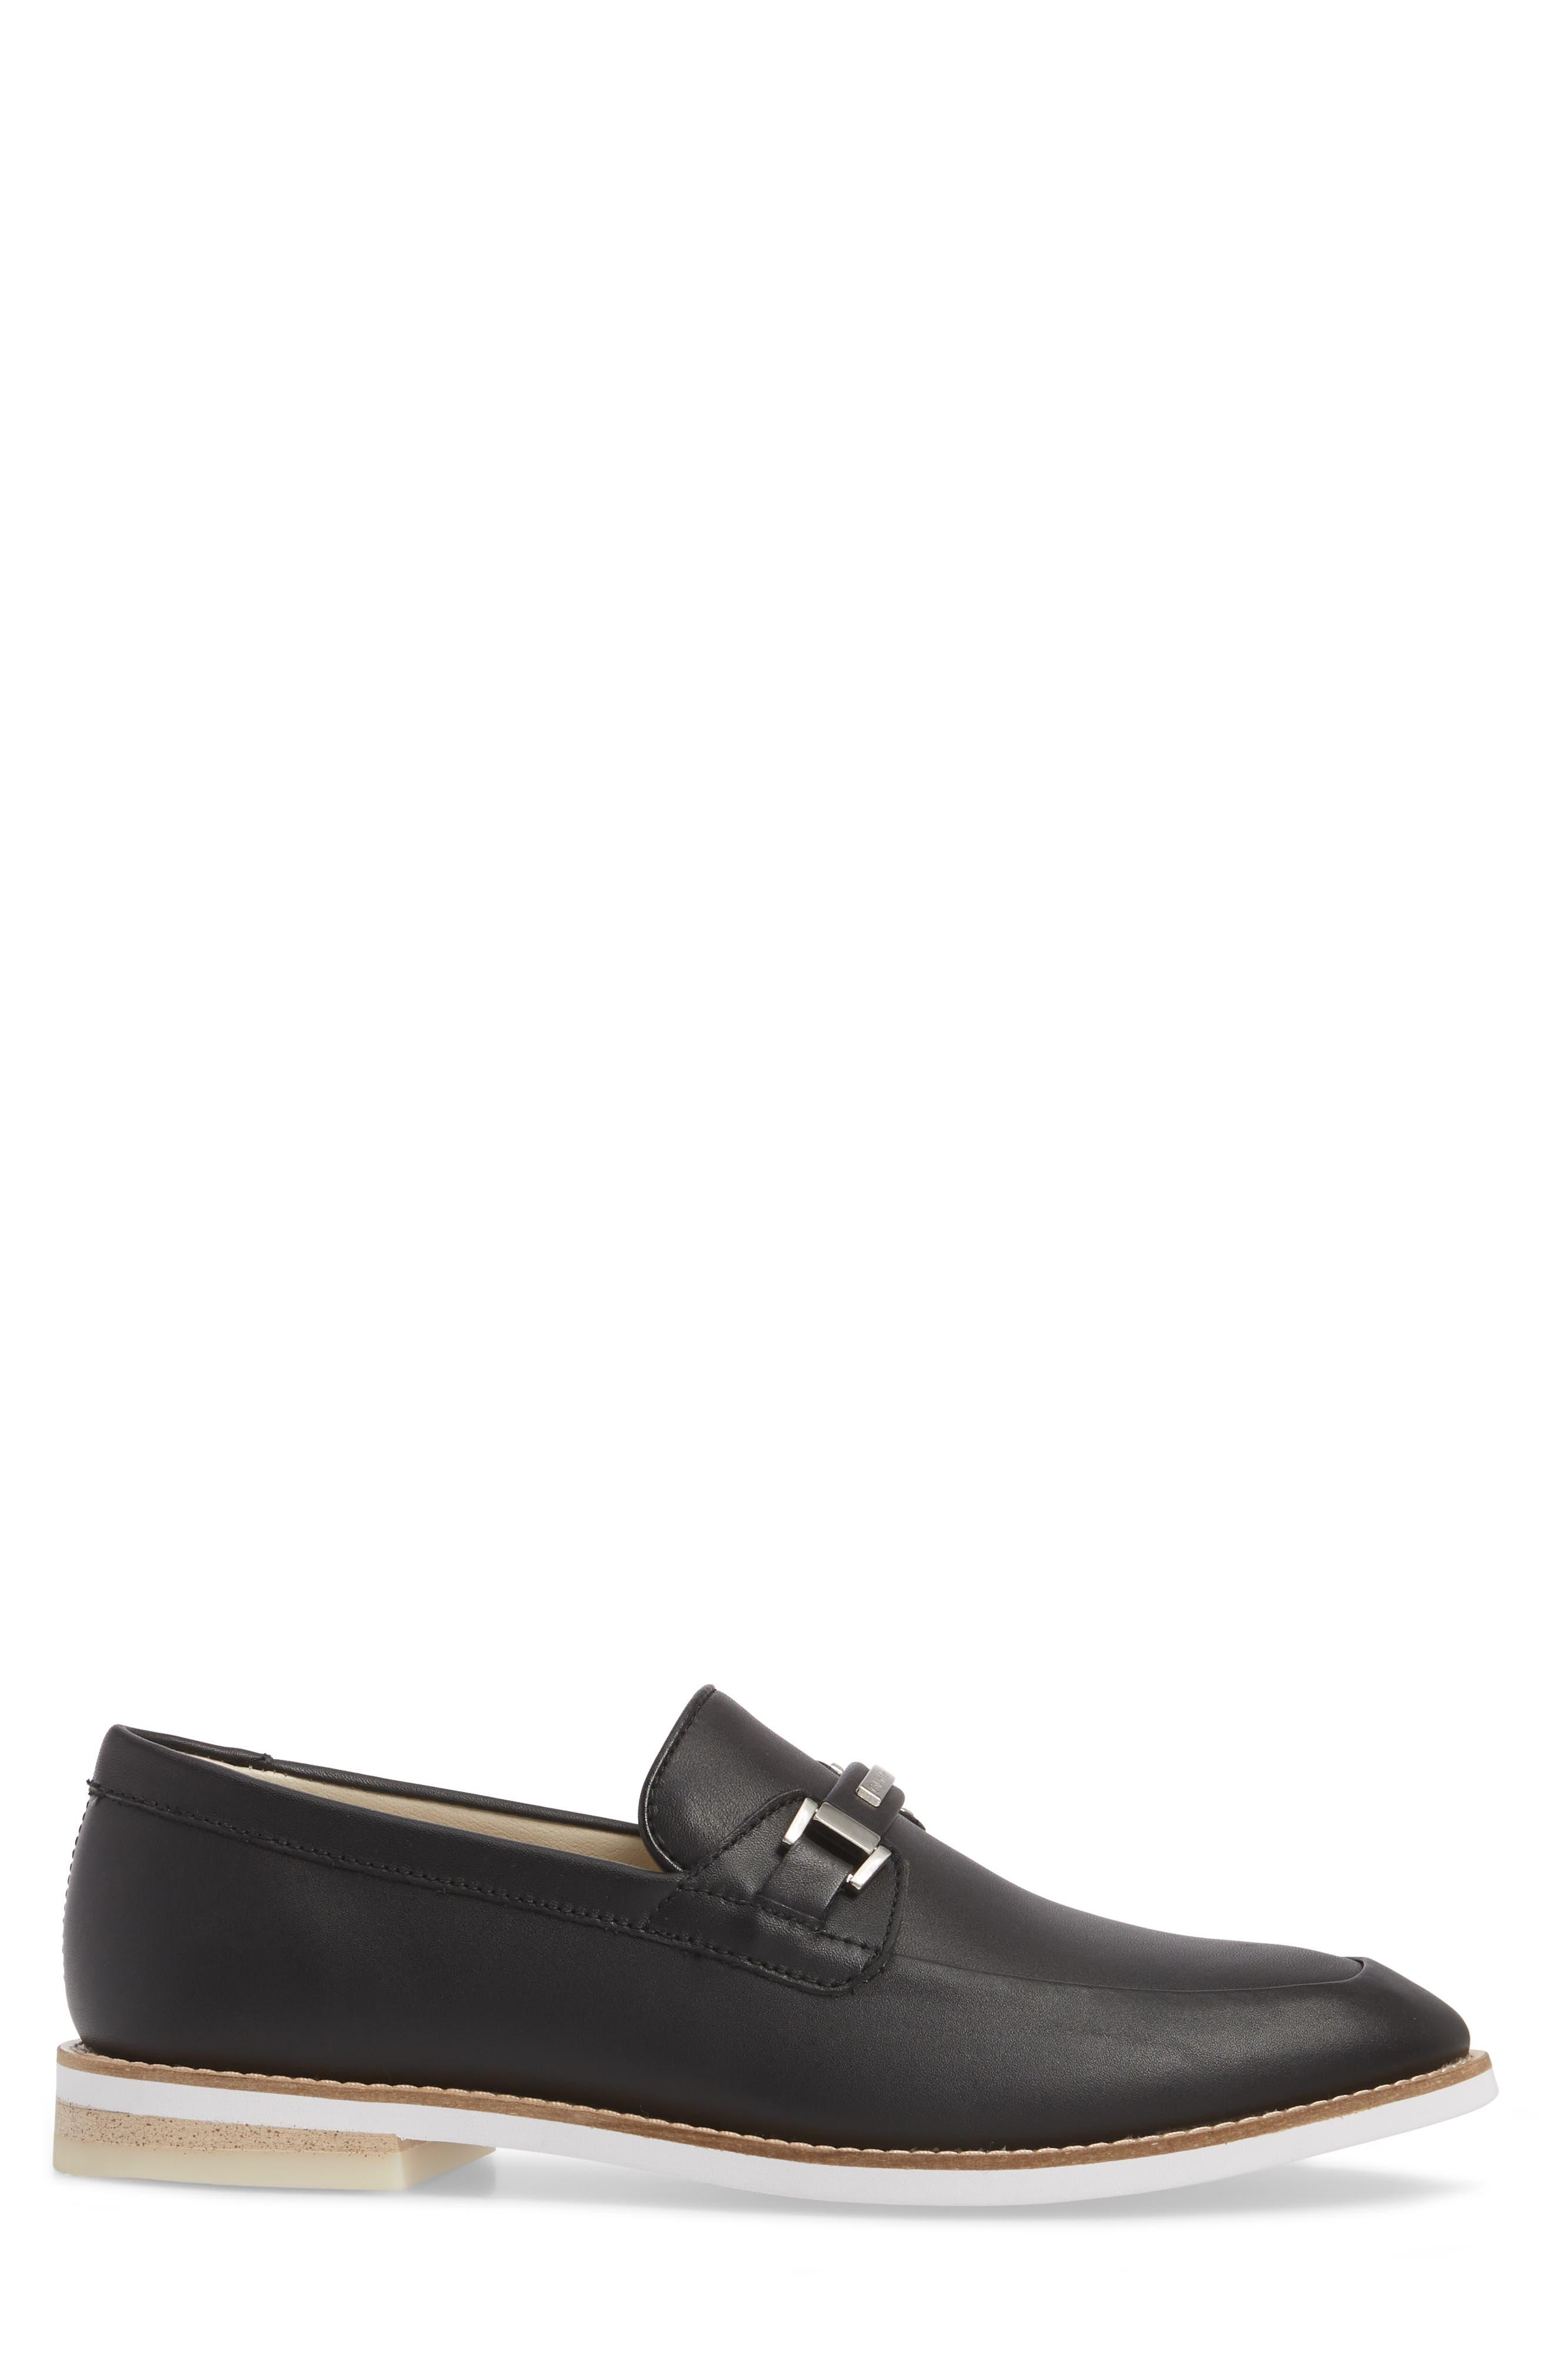 Adler Bit Loafer,                             Alternate thumbnail 3, color,                             Black Leather